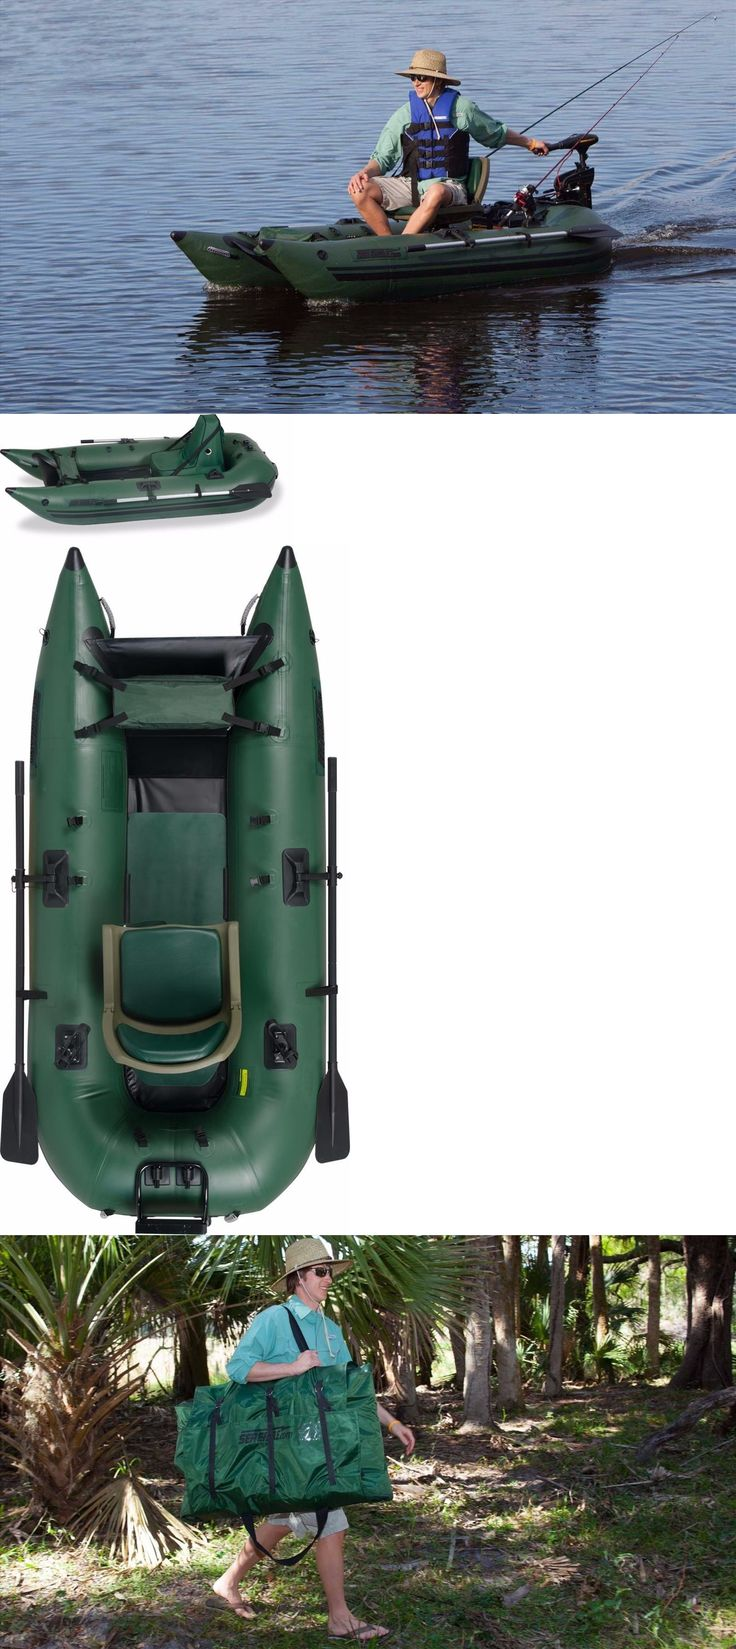 Best 25 fishing pontoon ideas on pinterest fishing for Best fishing pontoon boats